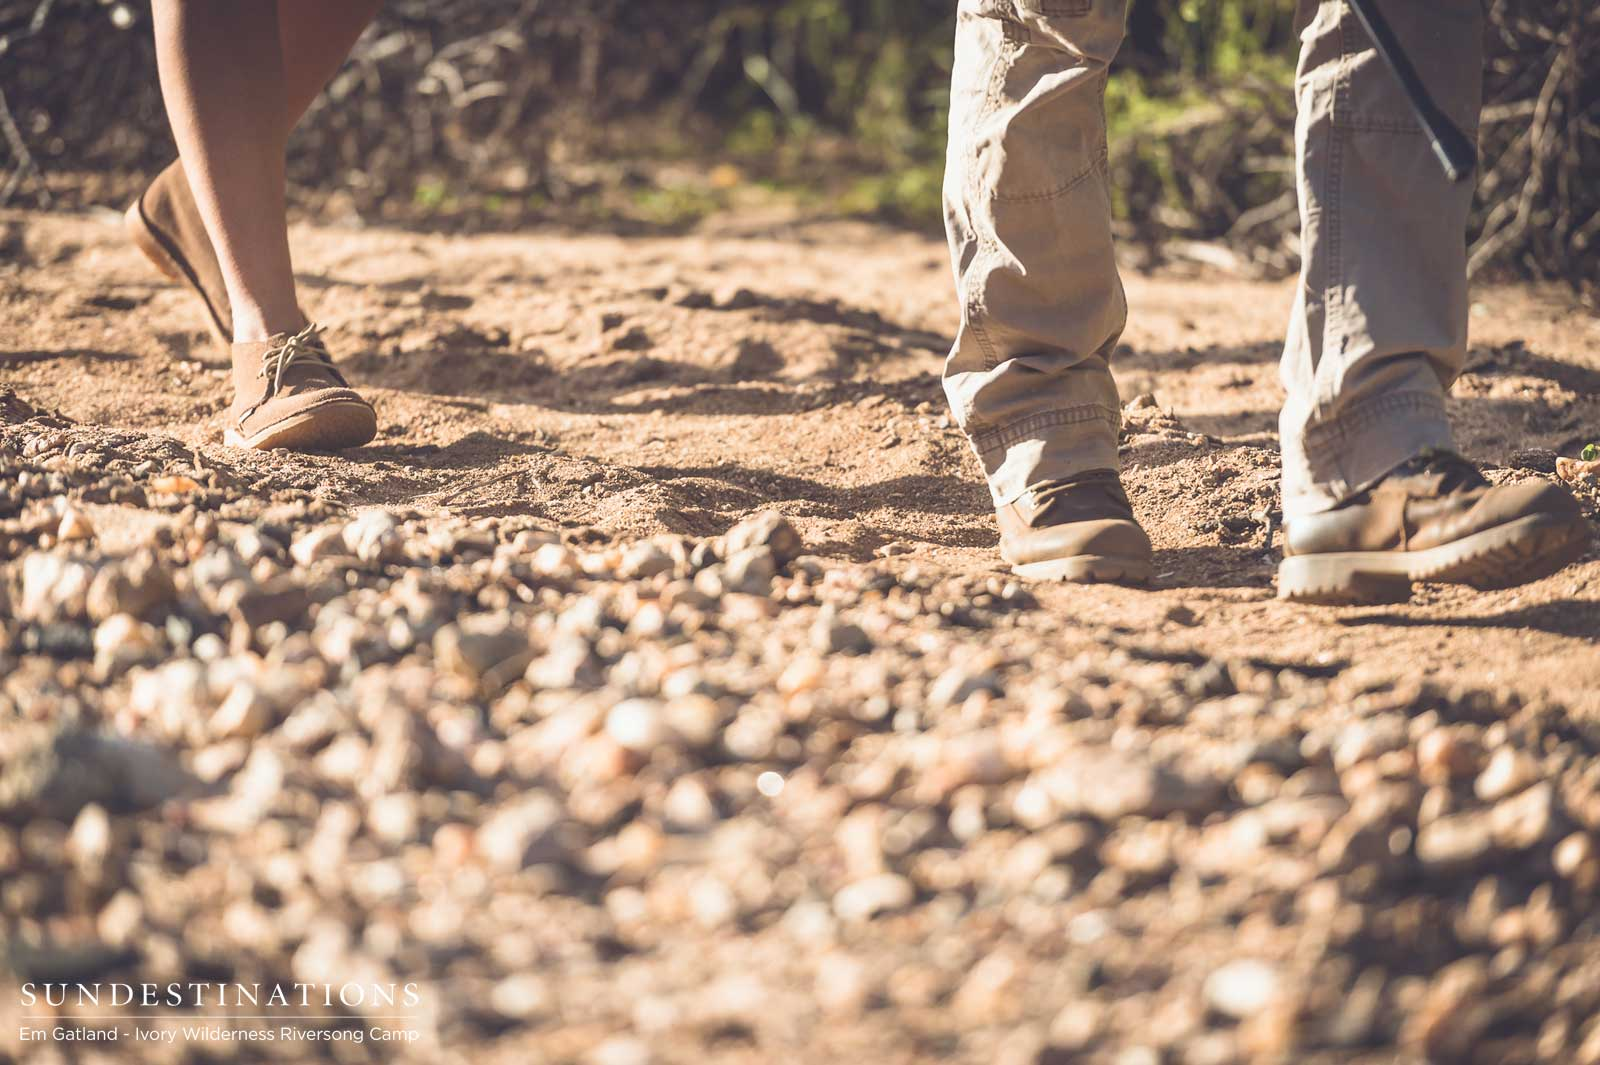 Ivory Wilderness Riversong Camp Walking Trails in Klaserie